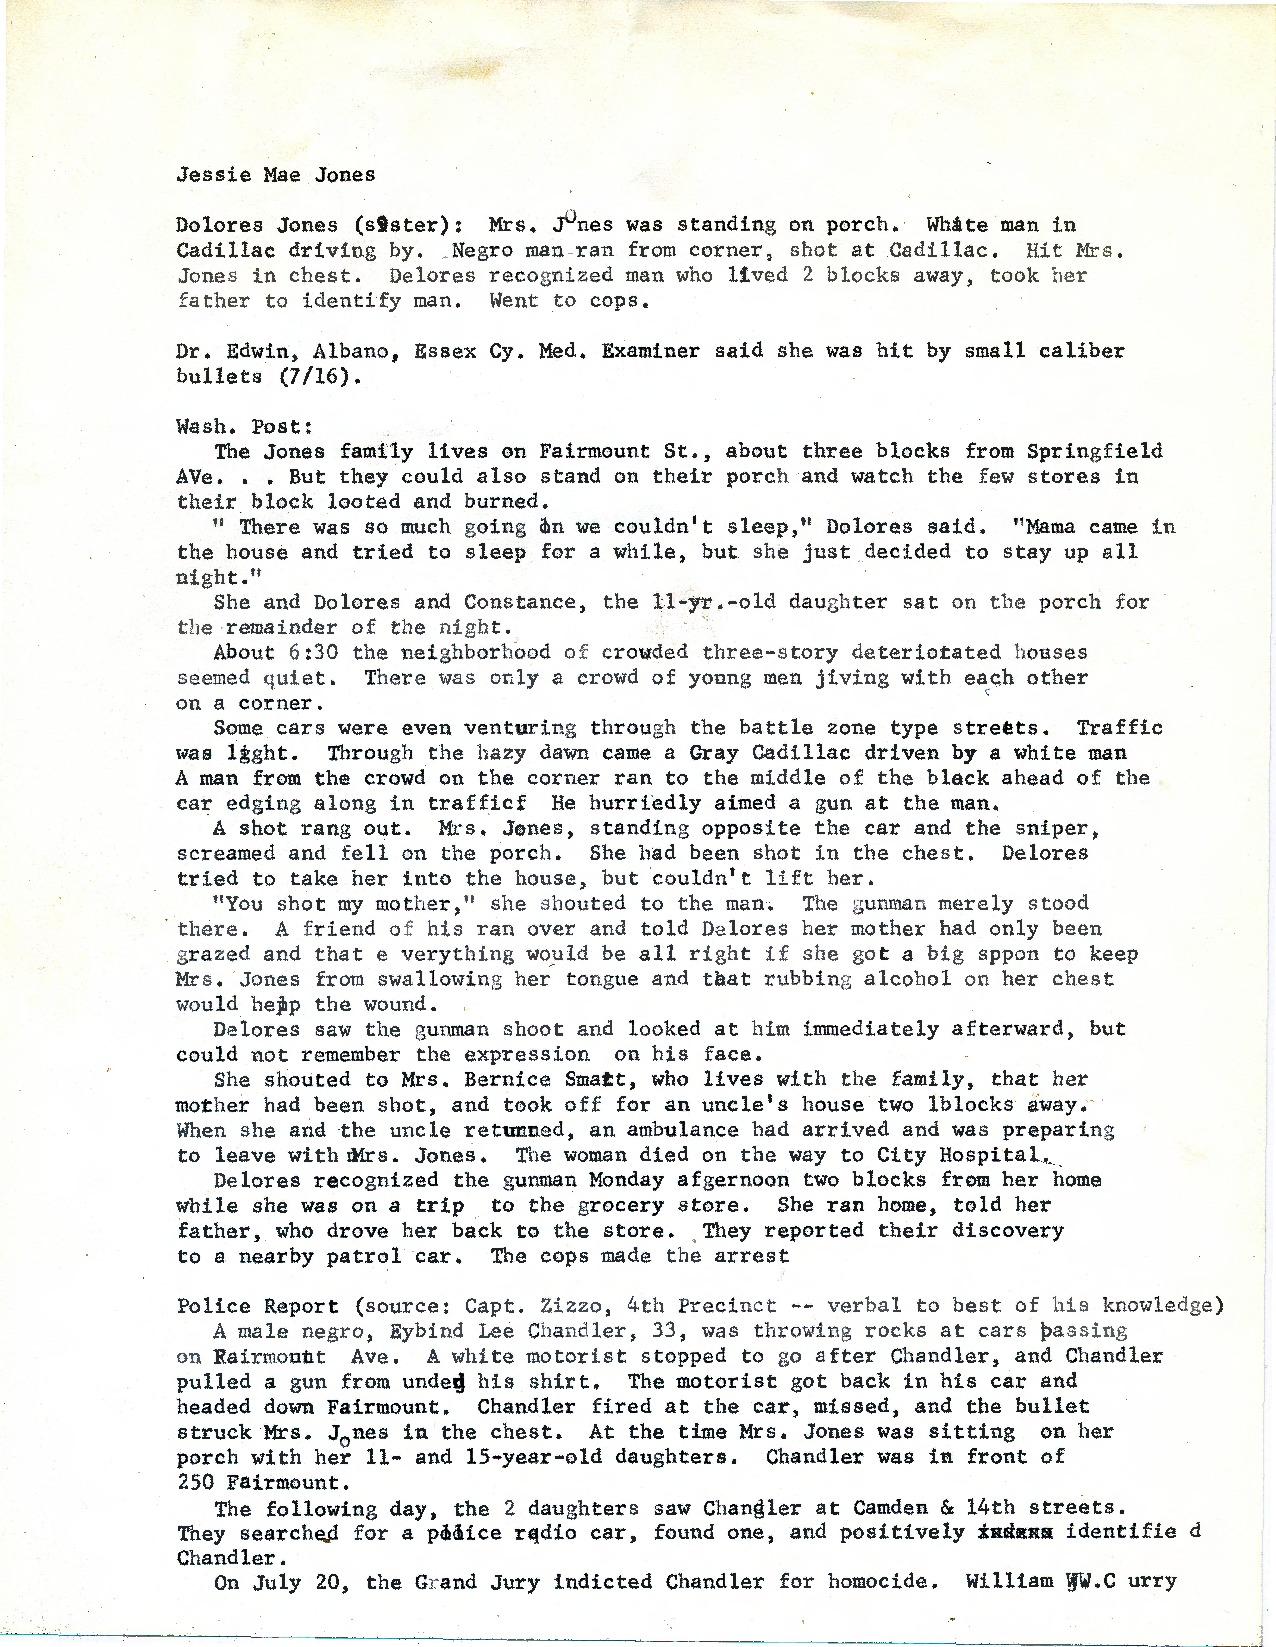 Briefs on Jesse Mae Jones